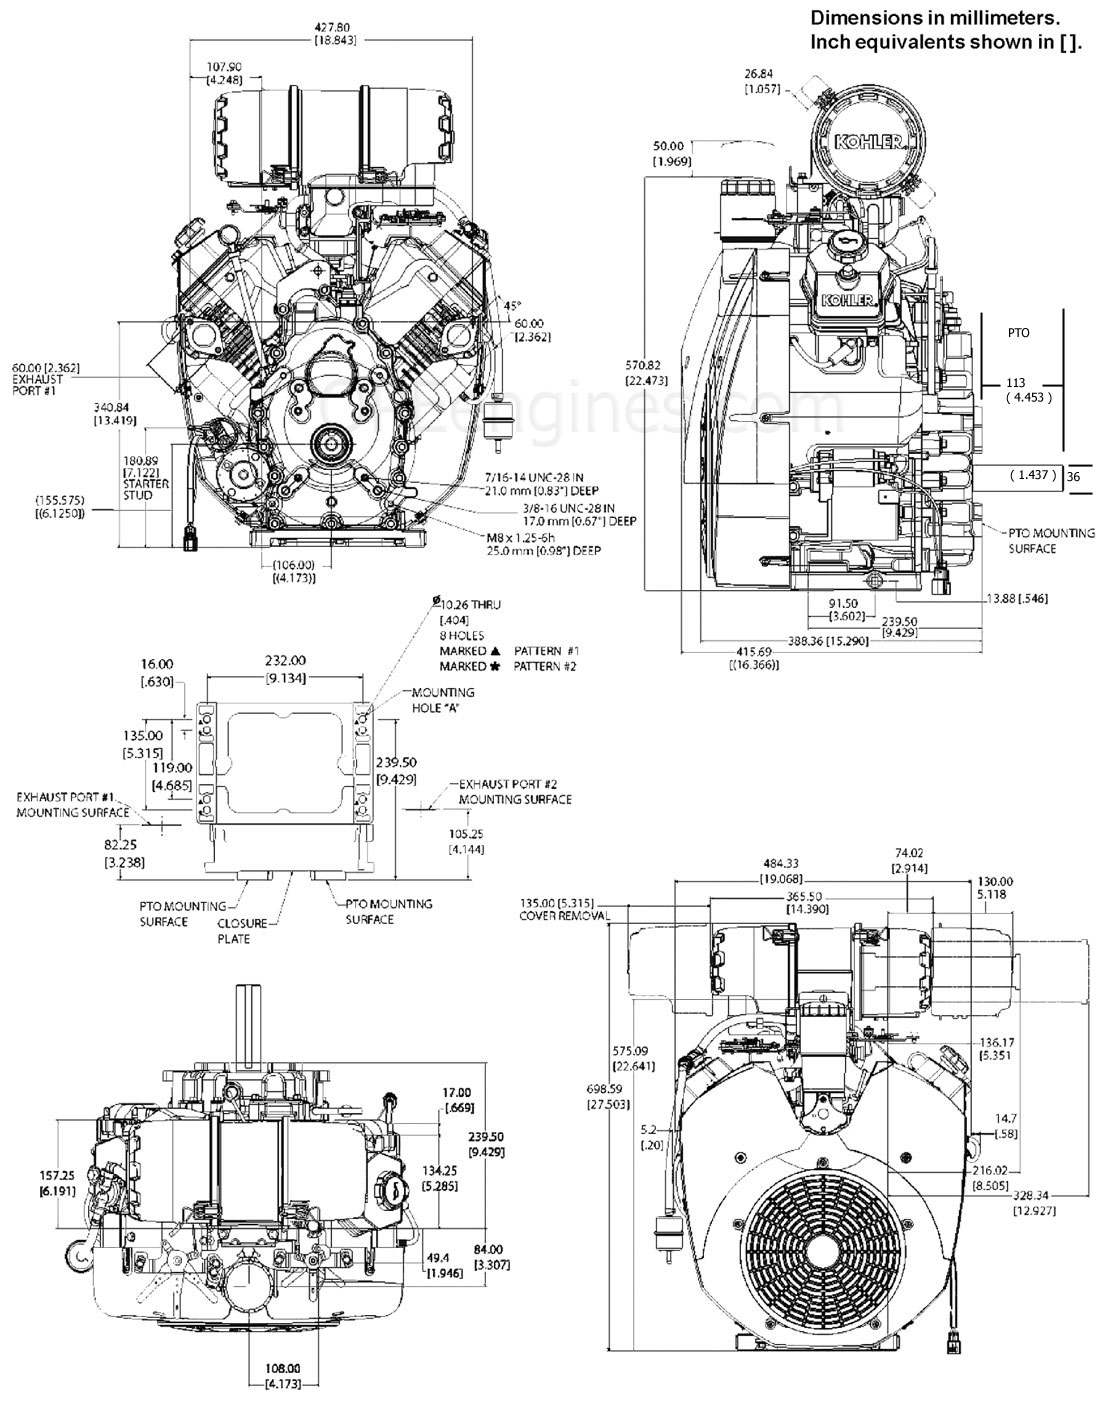 CH980_drawings?resize=680%2C878&ssl=1 25 hp kohler wiring diagram kohler command 25 hp diagram, kohler kohler motor wiring diagram at mifinder.co